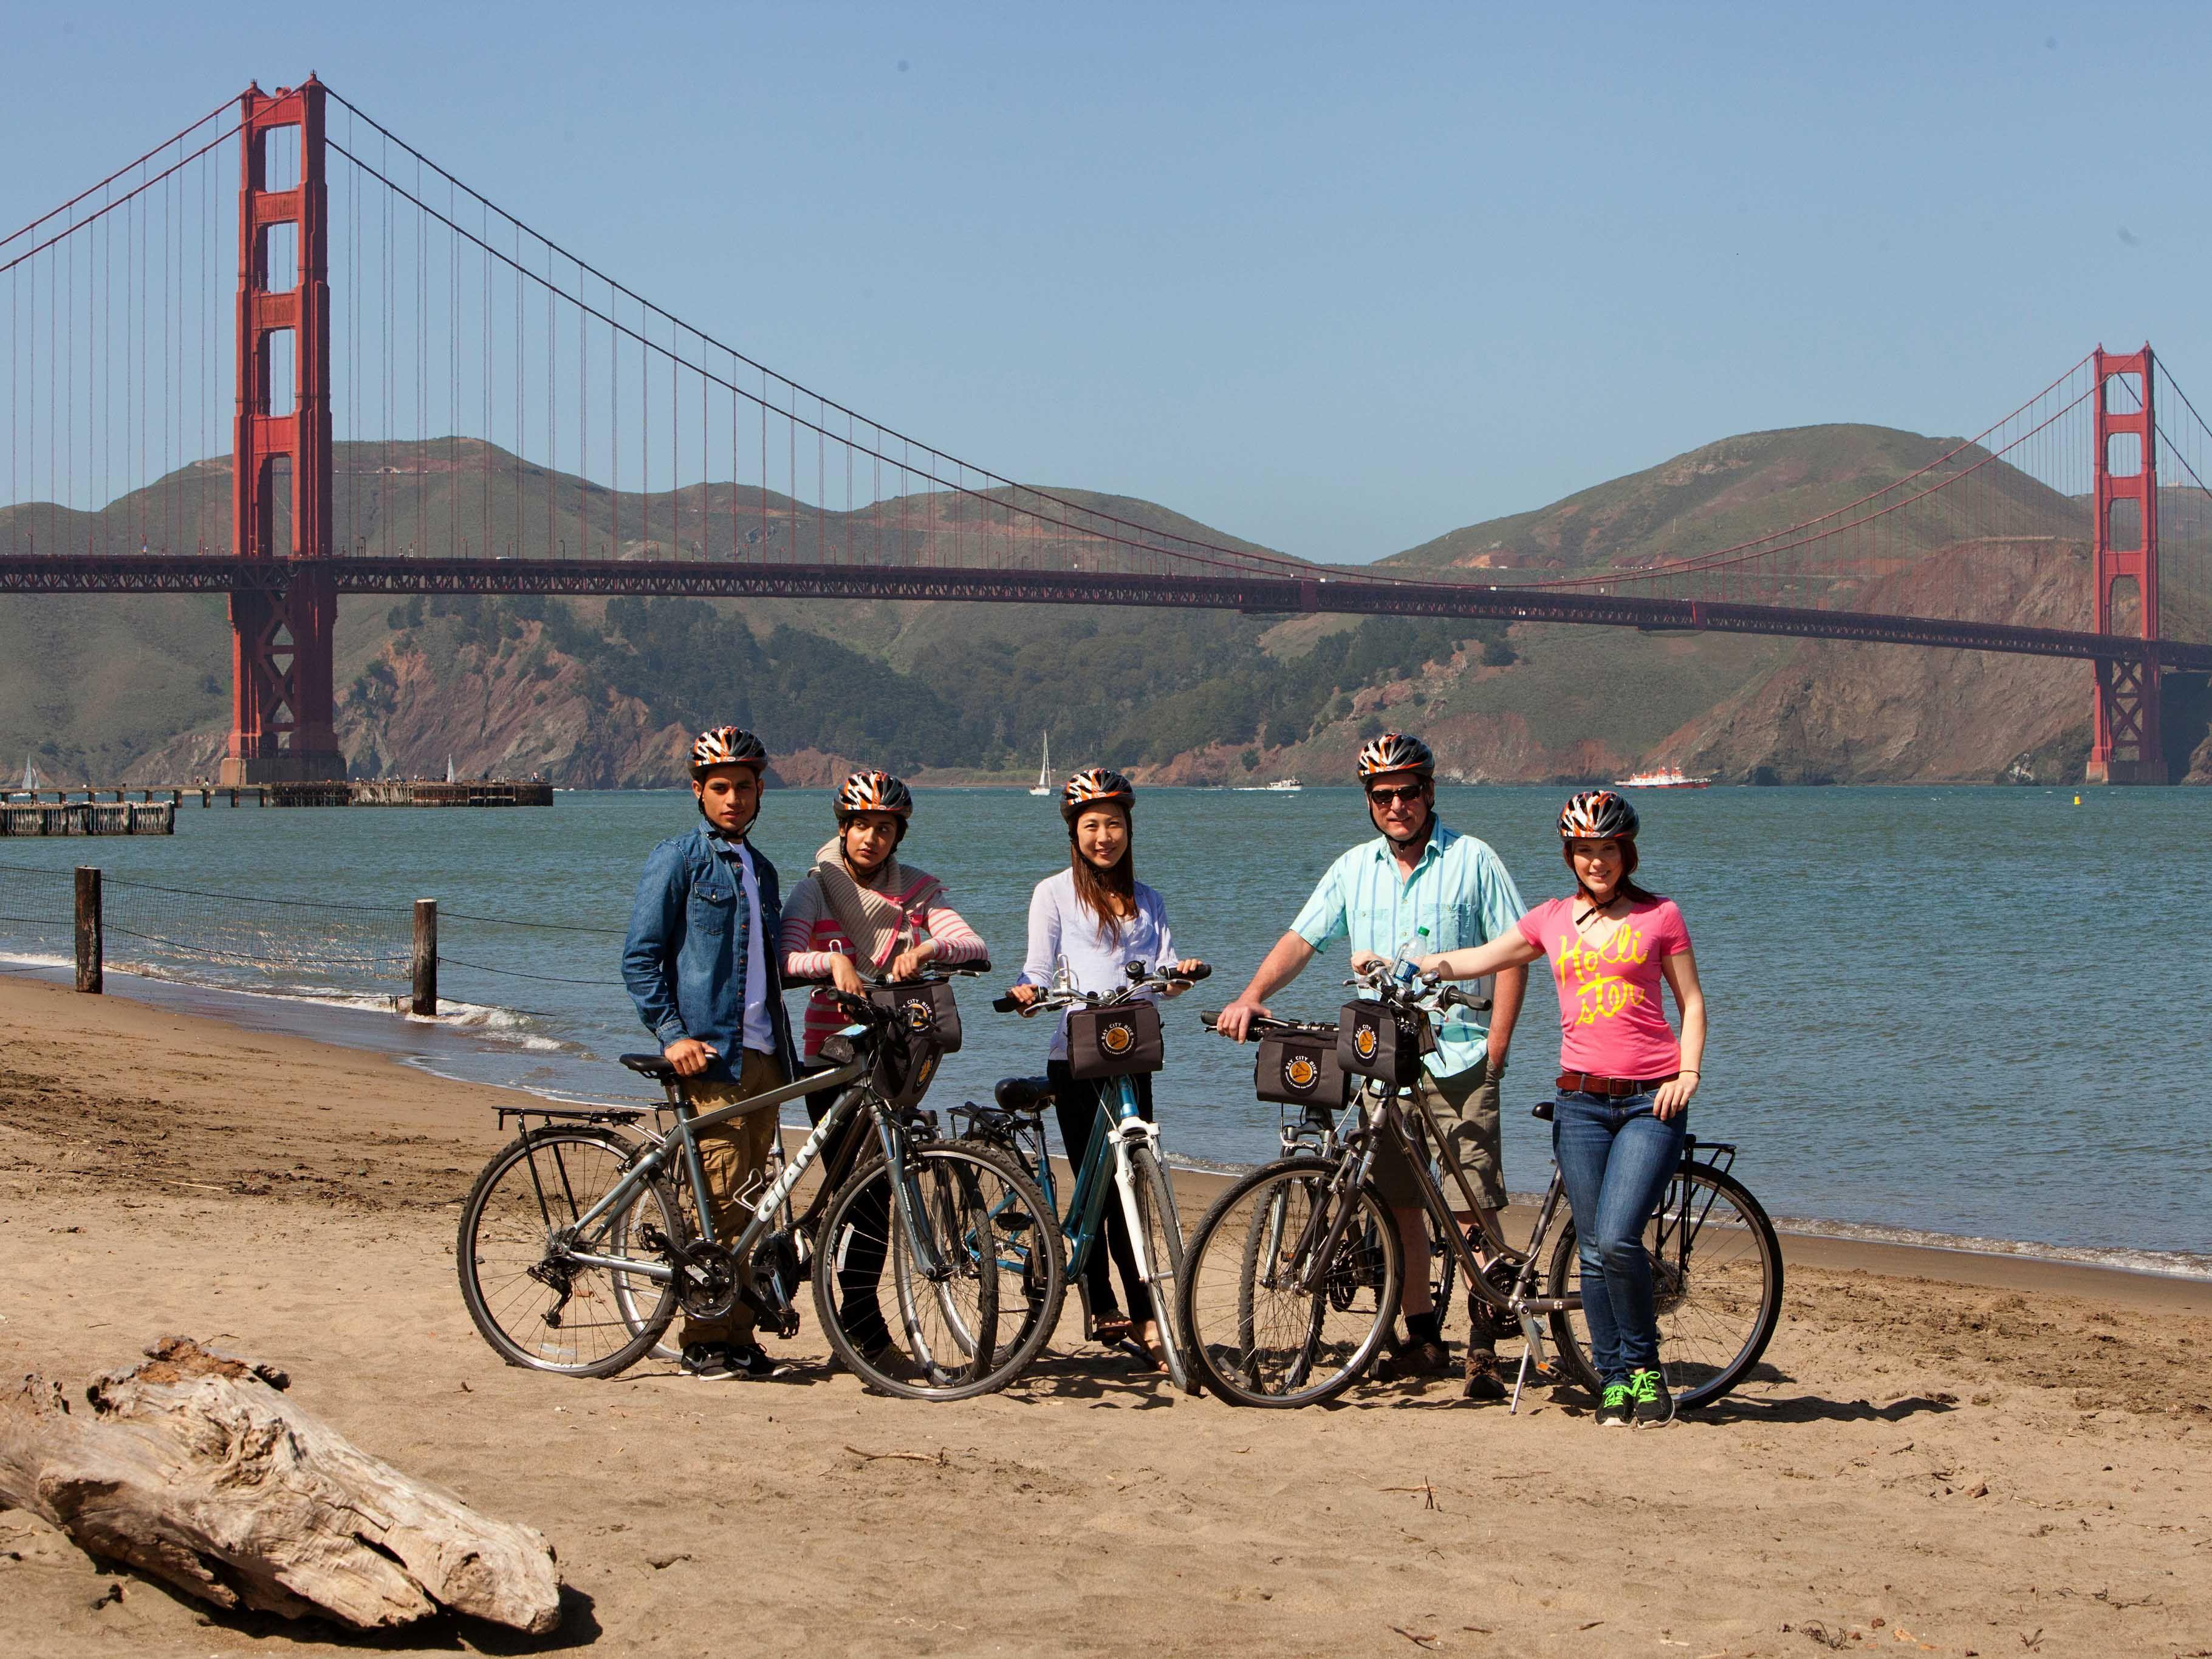 Bike the Dolden Gate Bridge